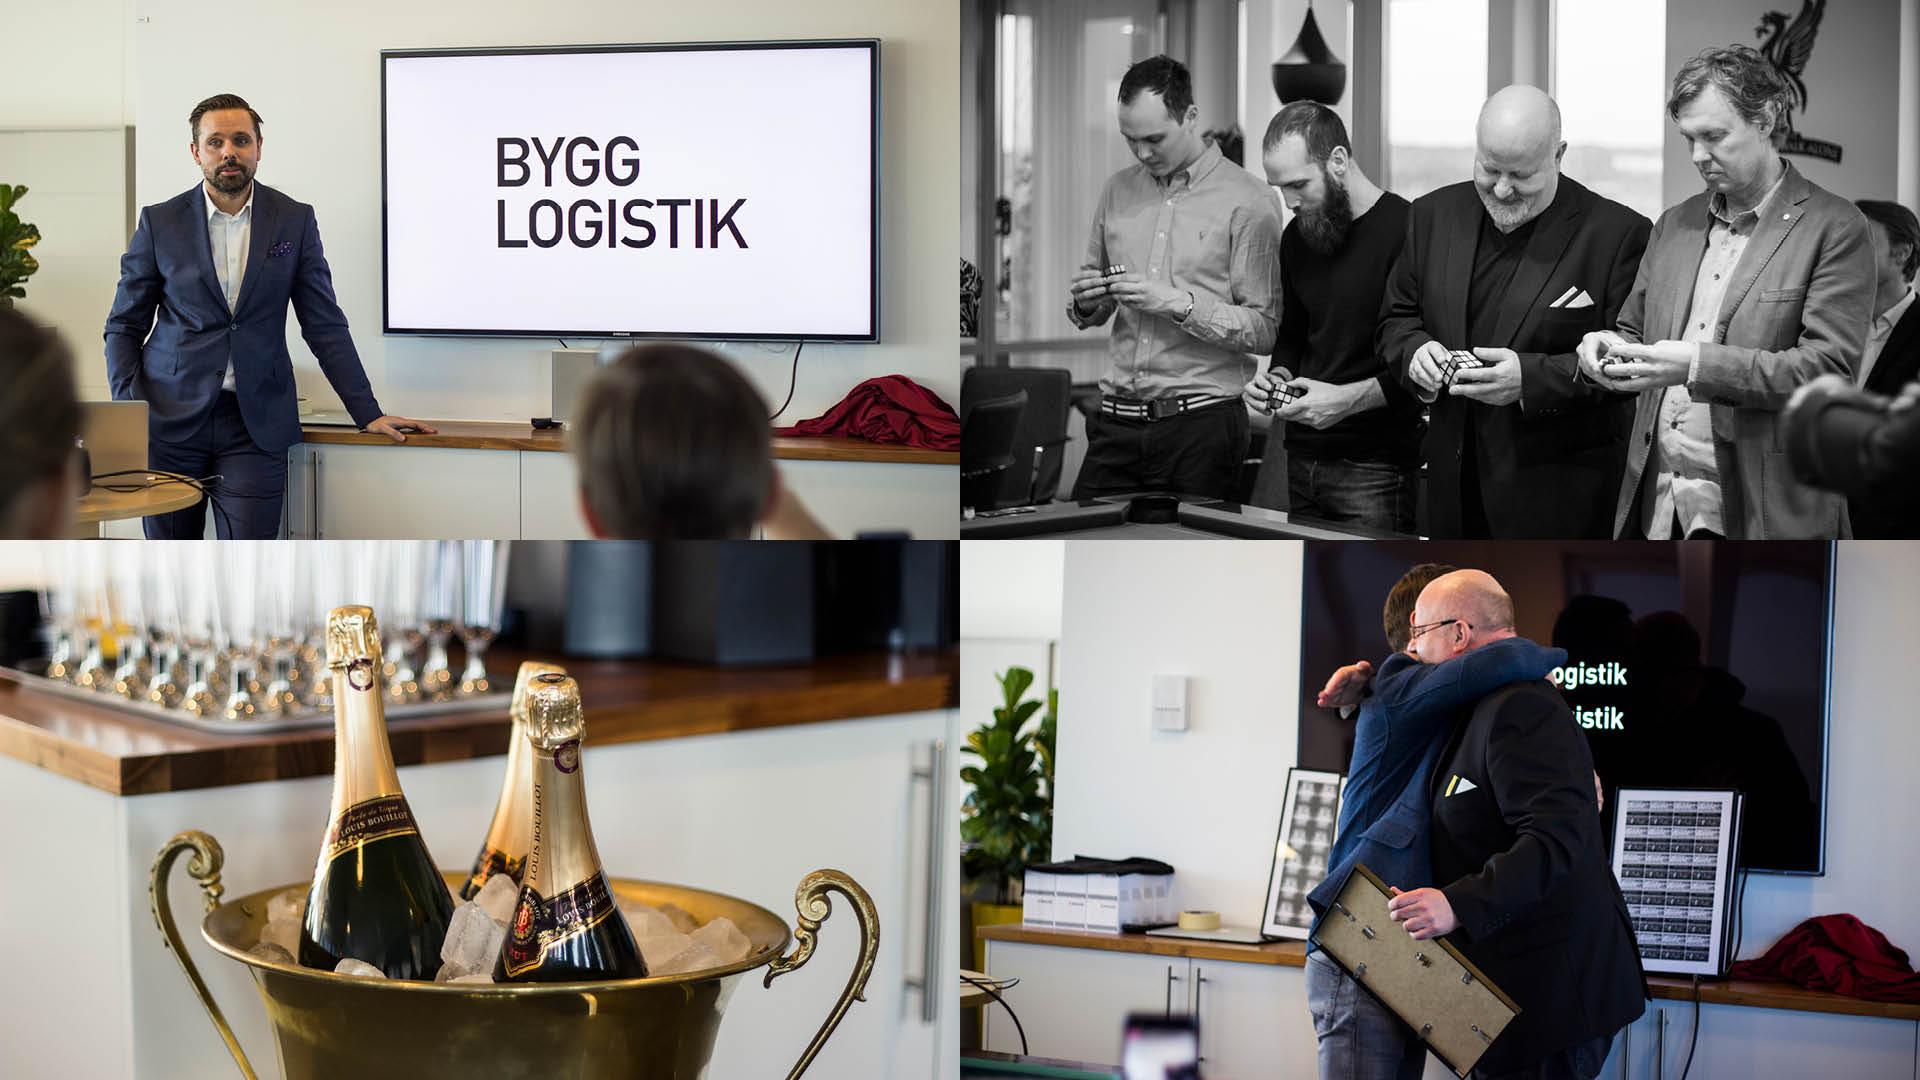 Bygglogistik - Building a brand